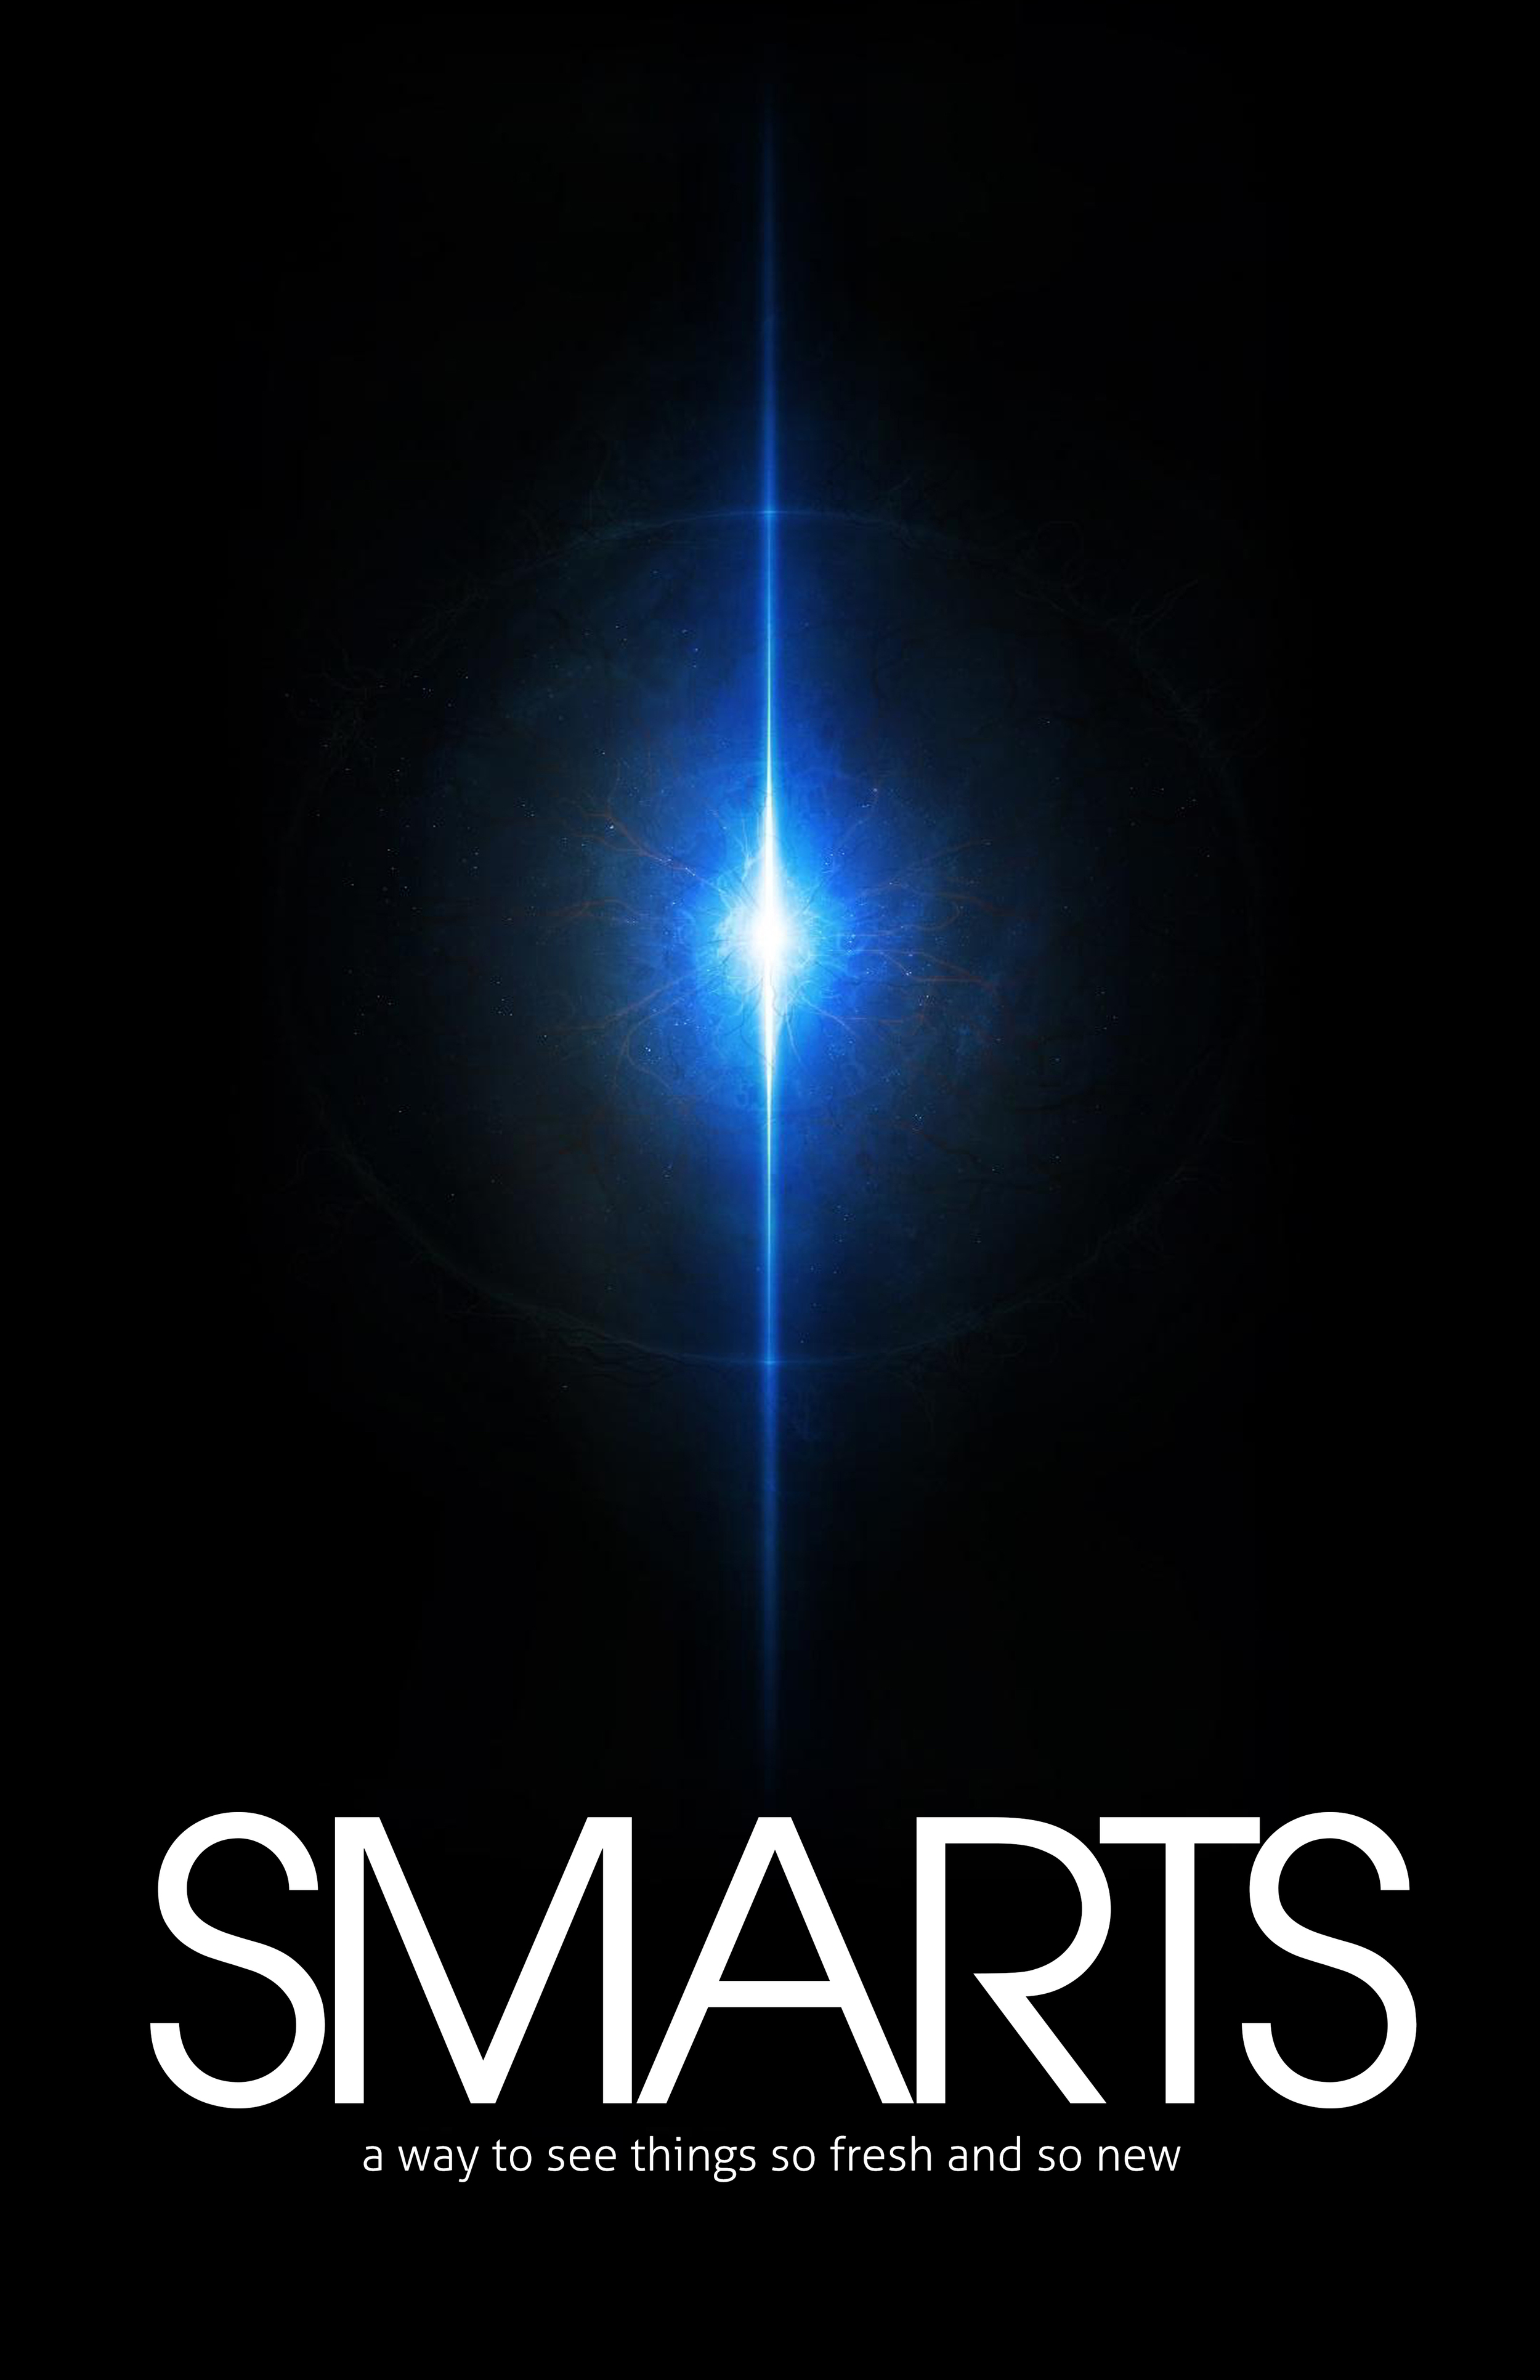 Smarts_One-Sheet_2.jpg